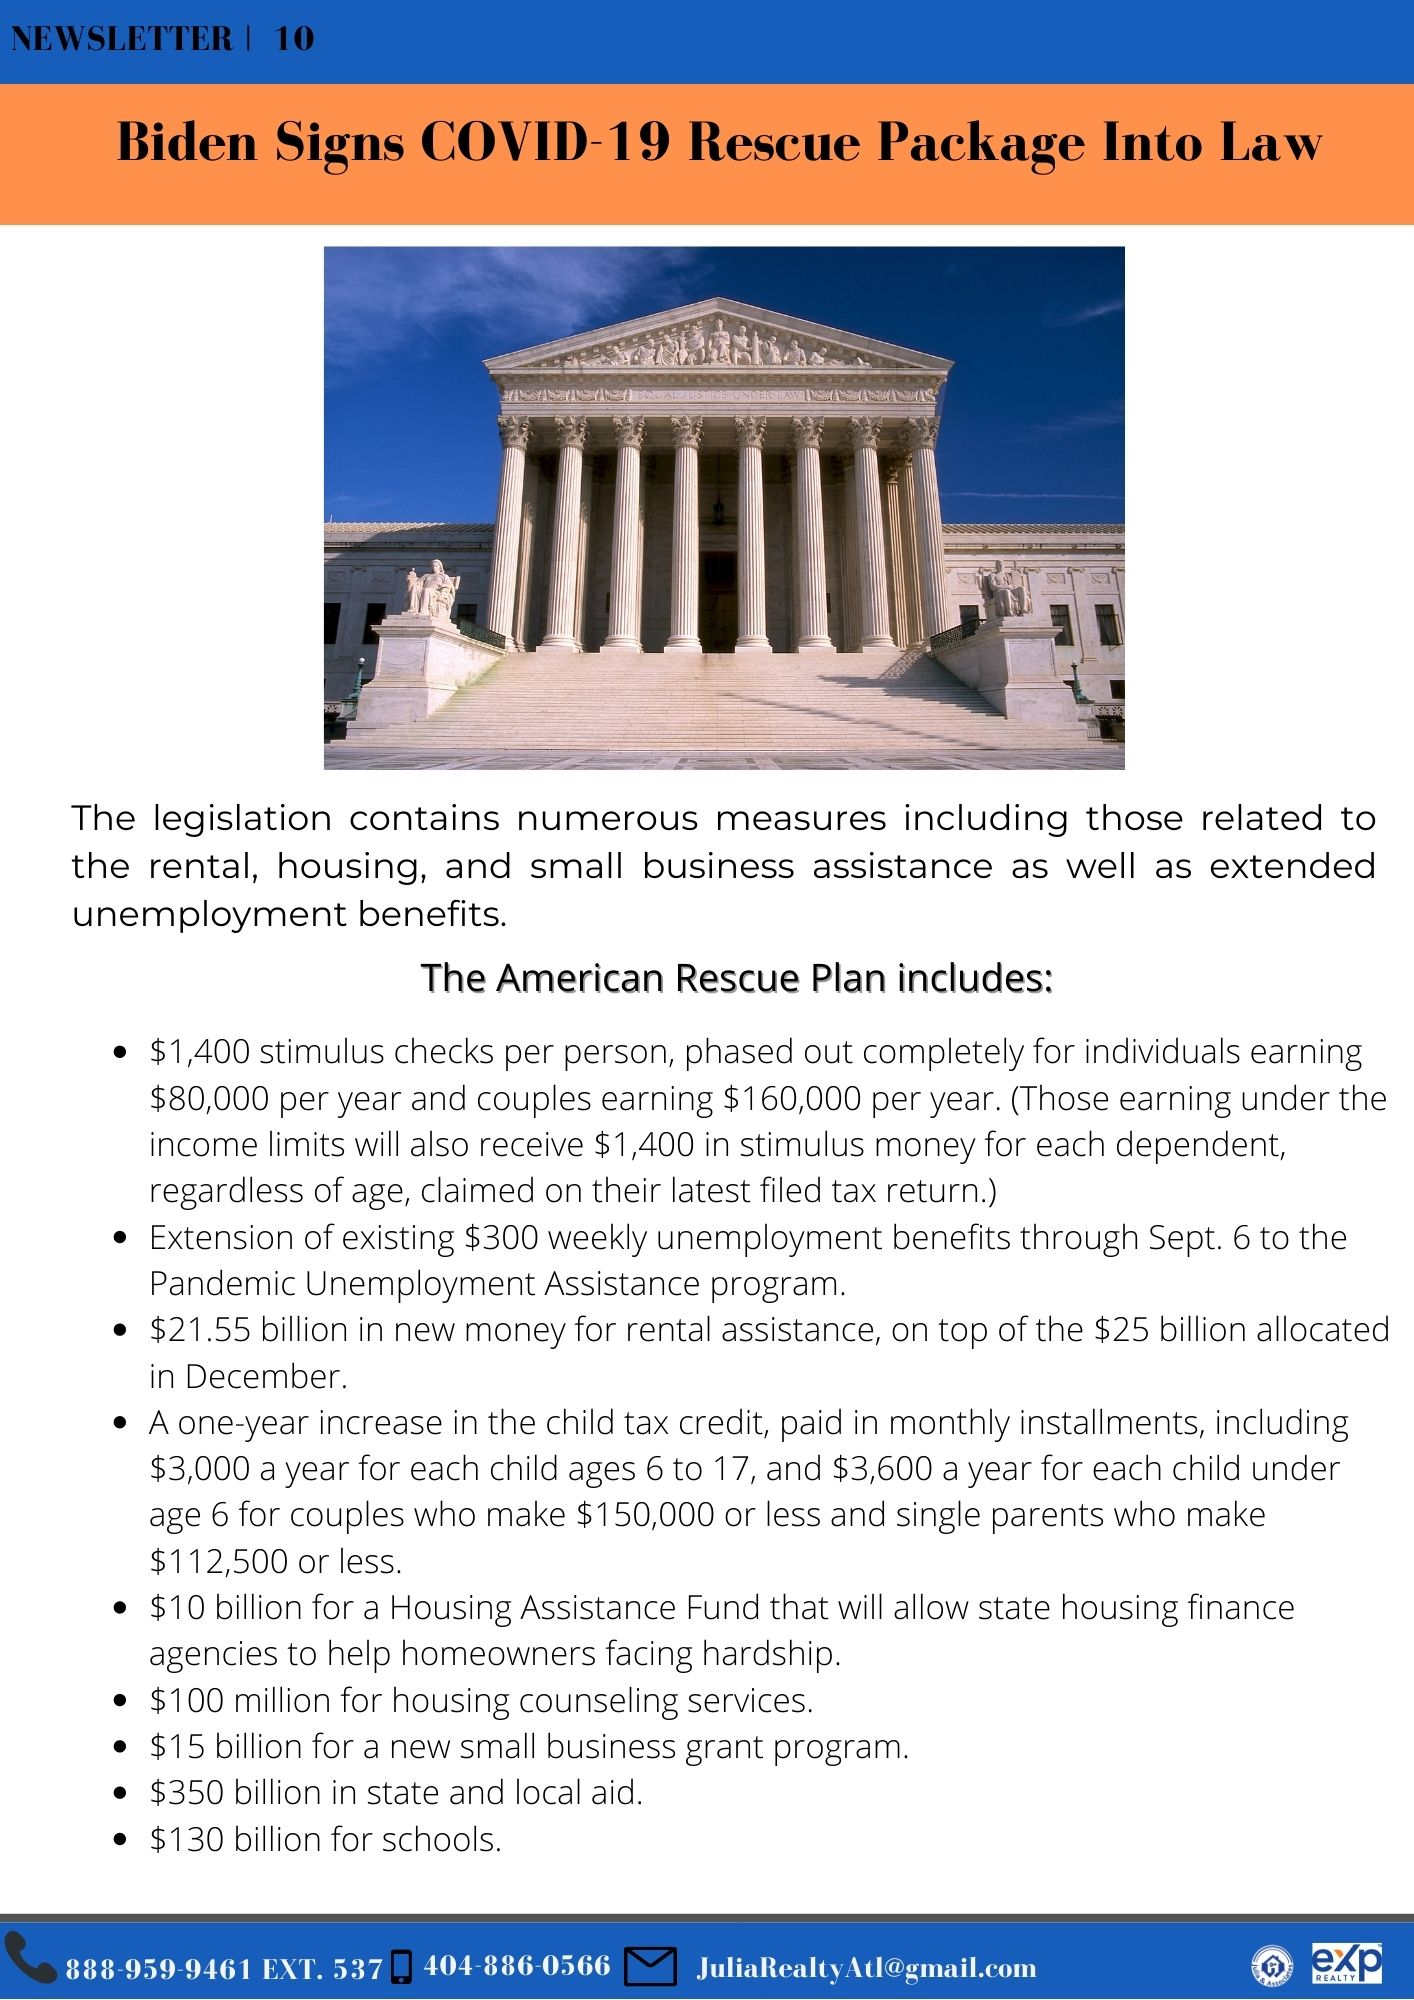 Copy of NEWSLETTER March(9).jpg